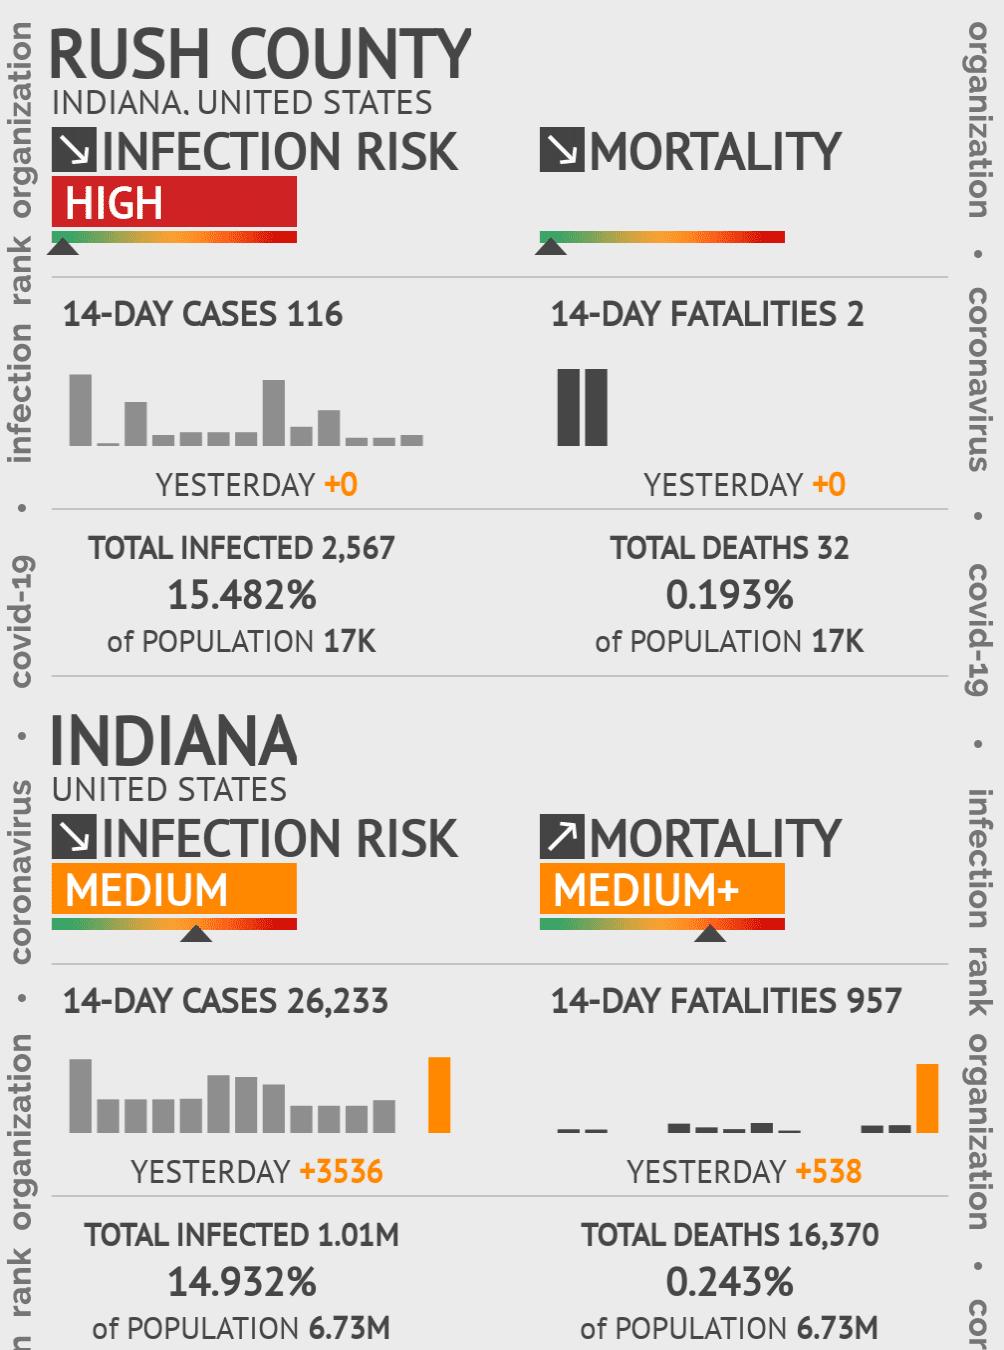 Rush County Coronavirus Covid-19 Risk of Infection on July 24, 2021